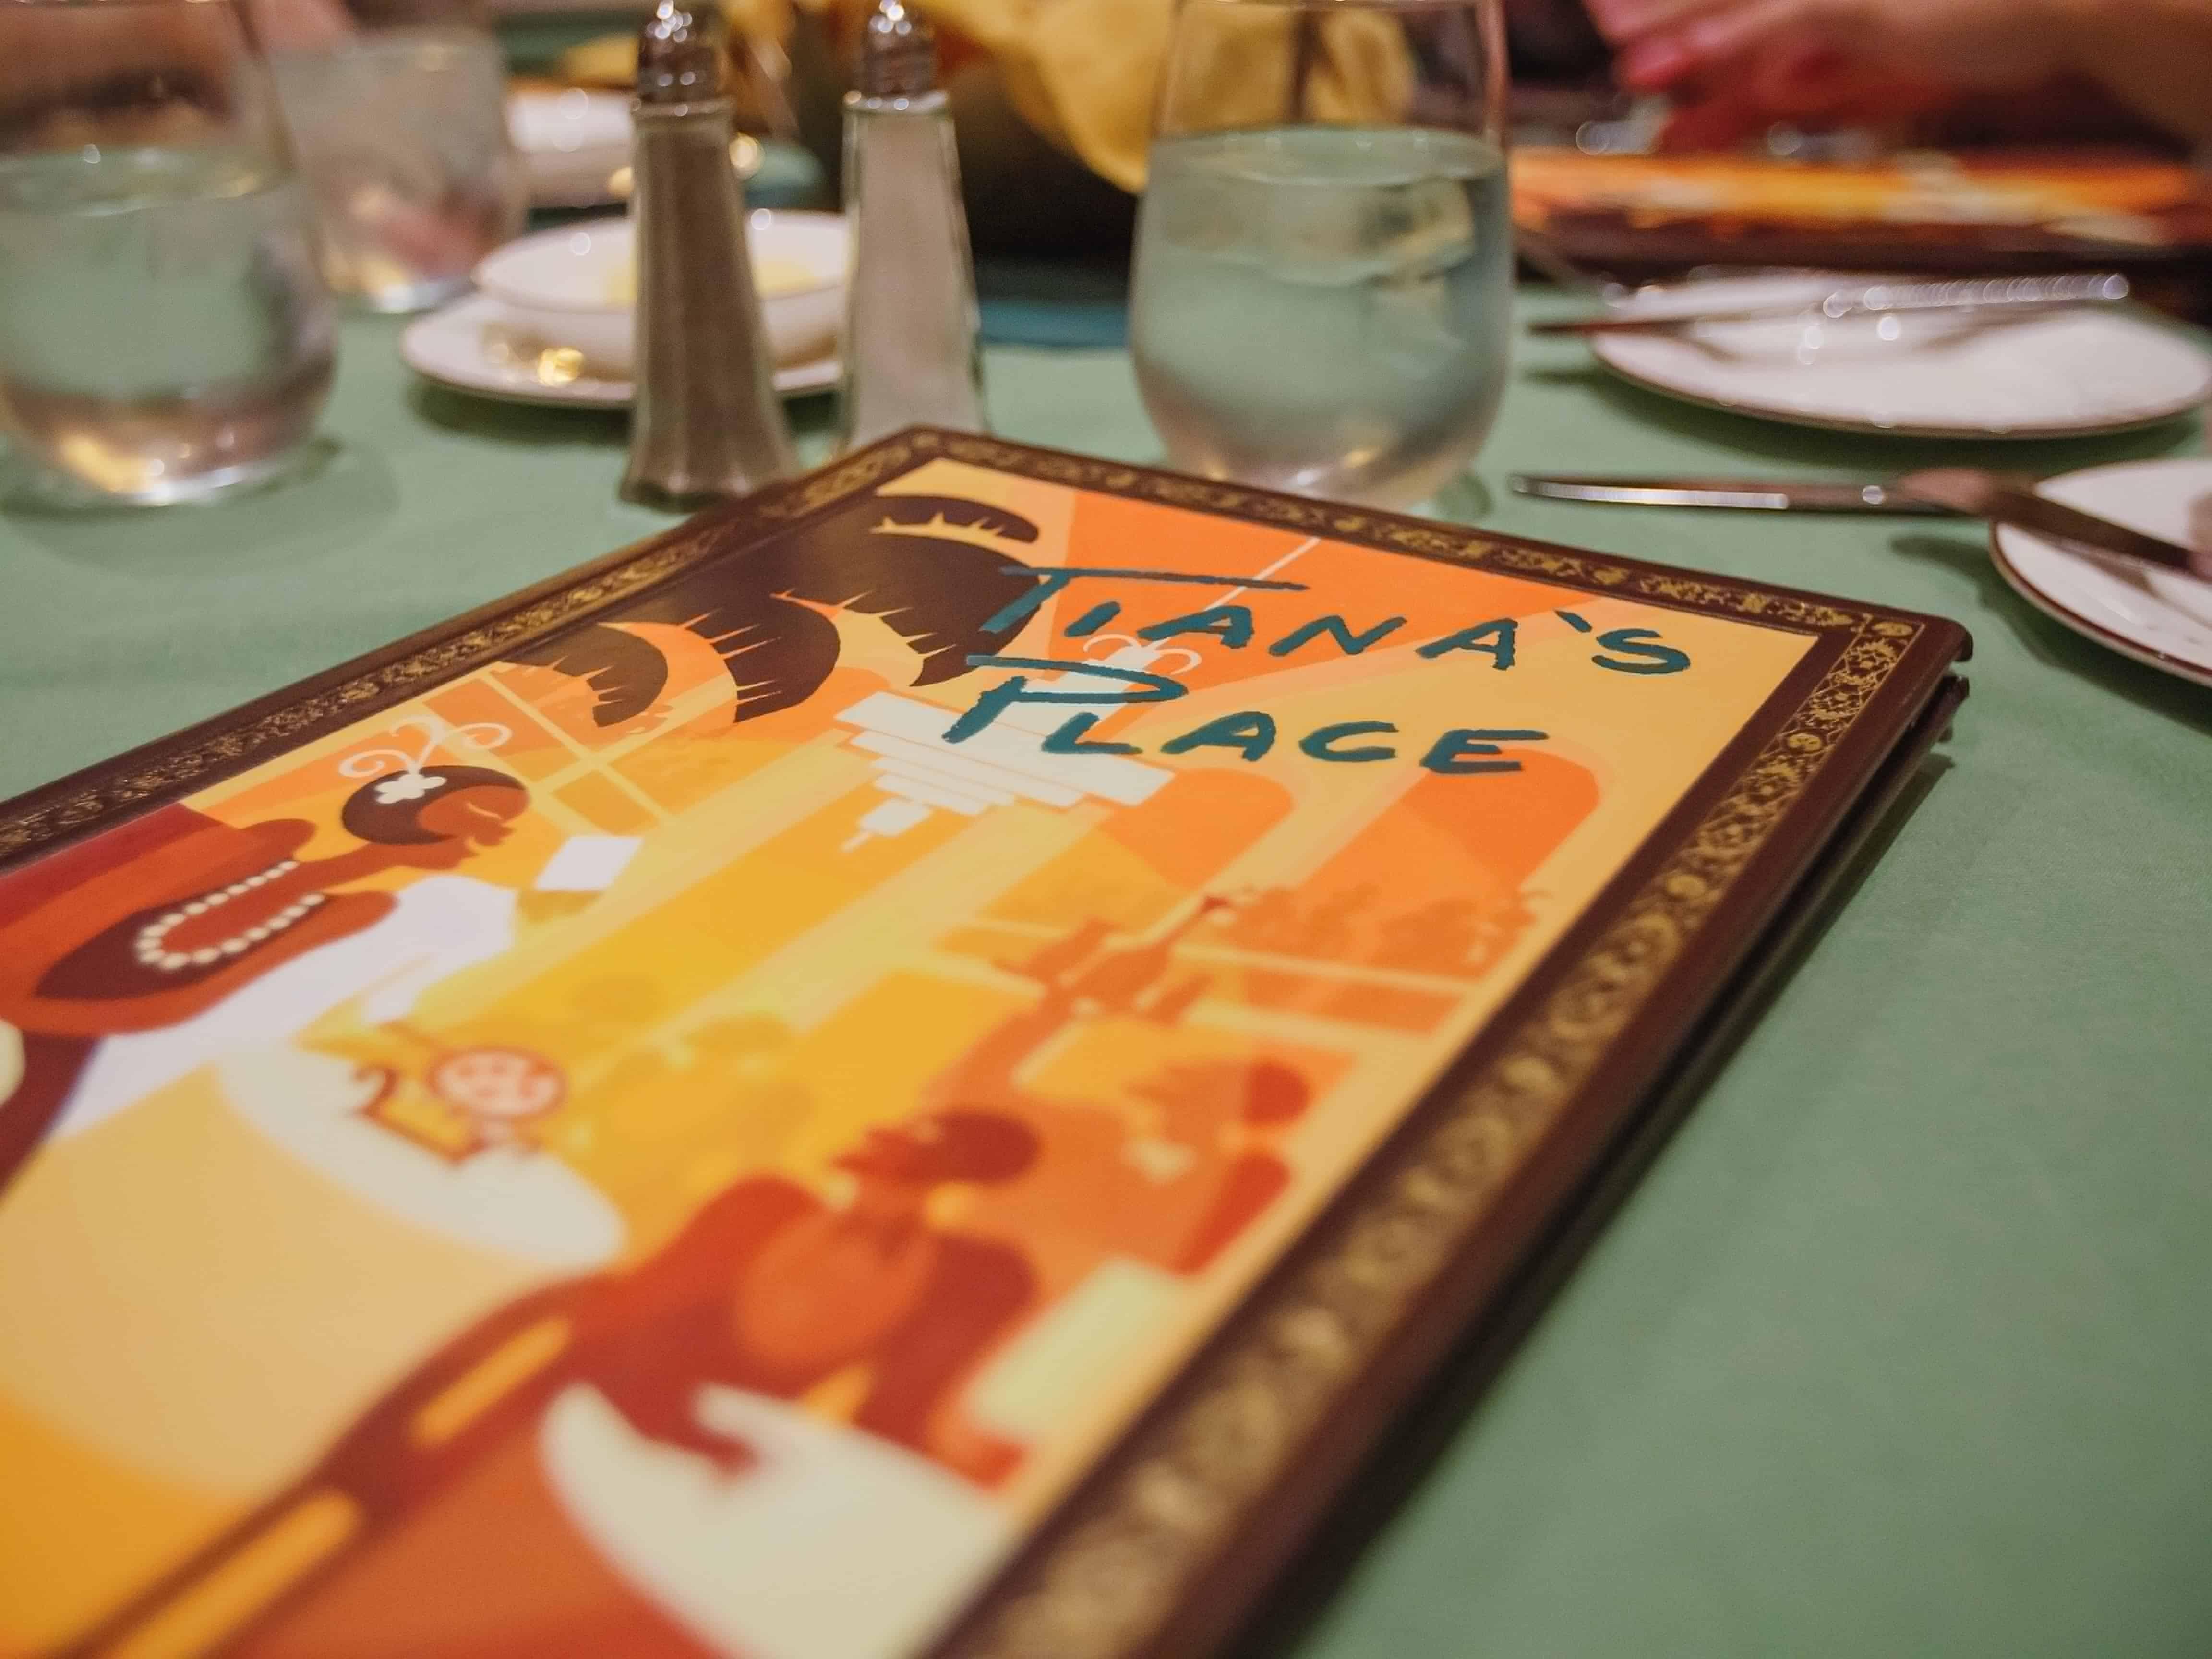 Disney Wonder Tiana S Place Menu Everythingmouse Guide To